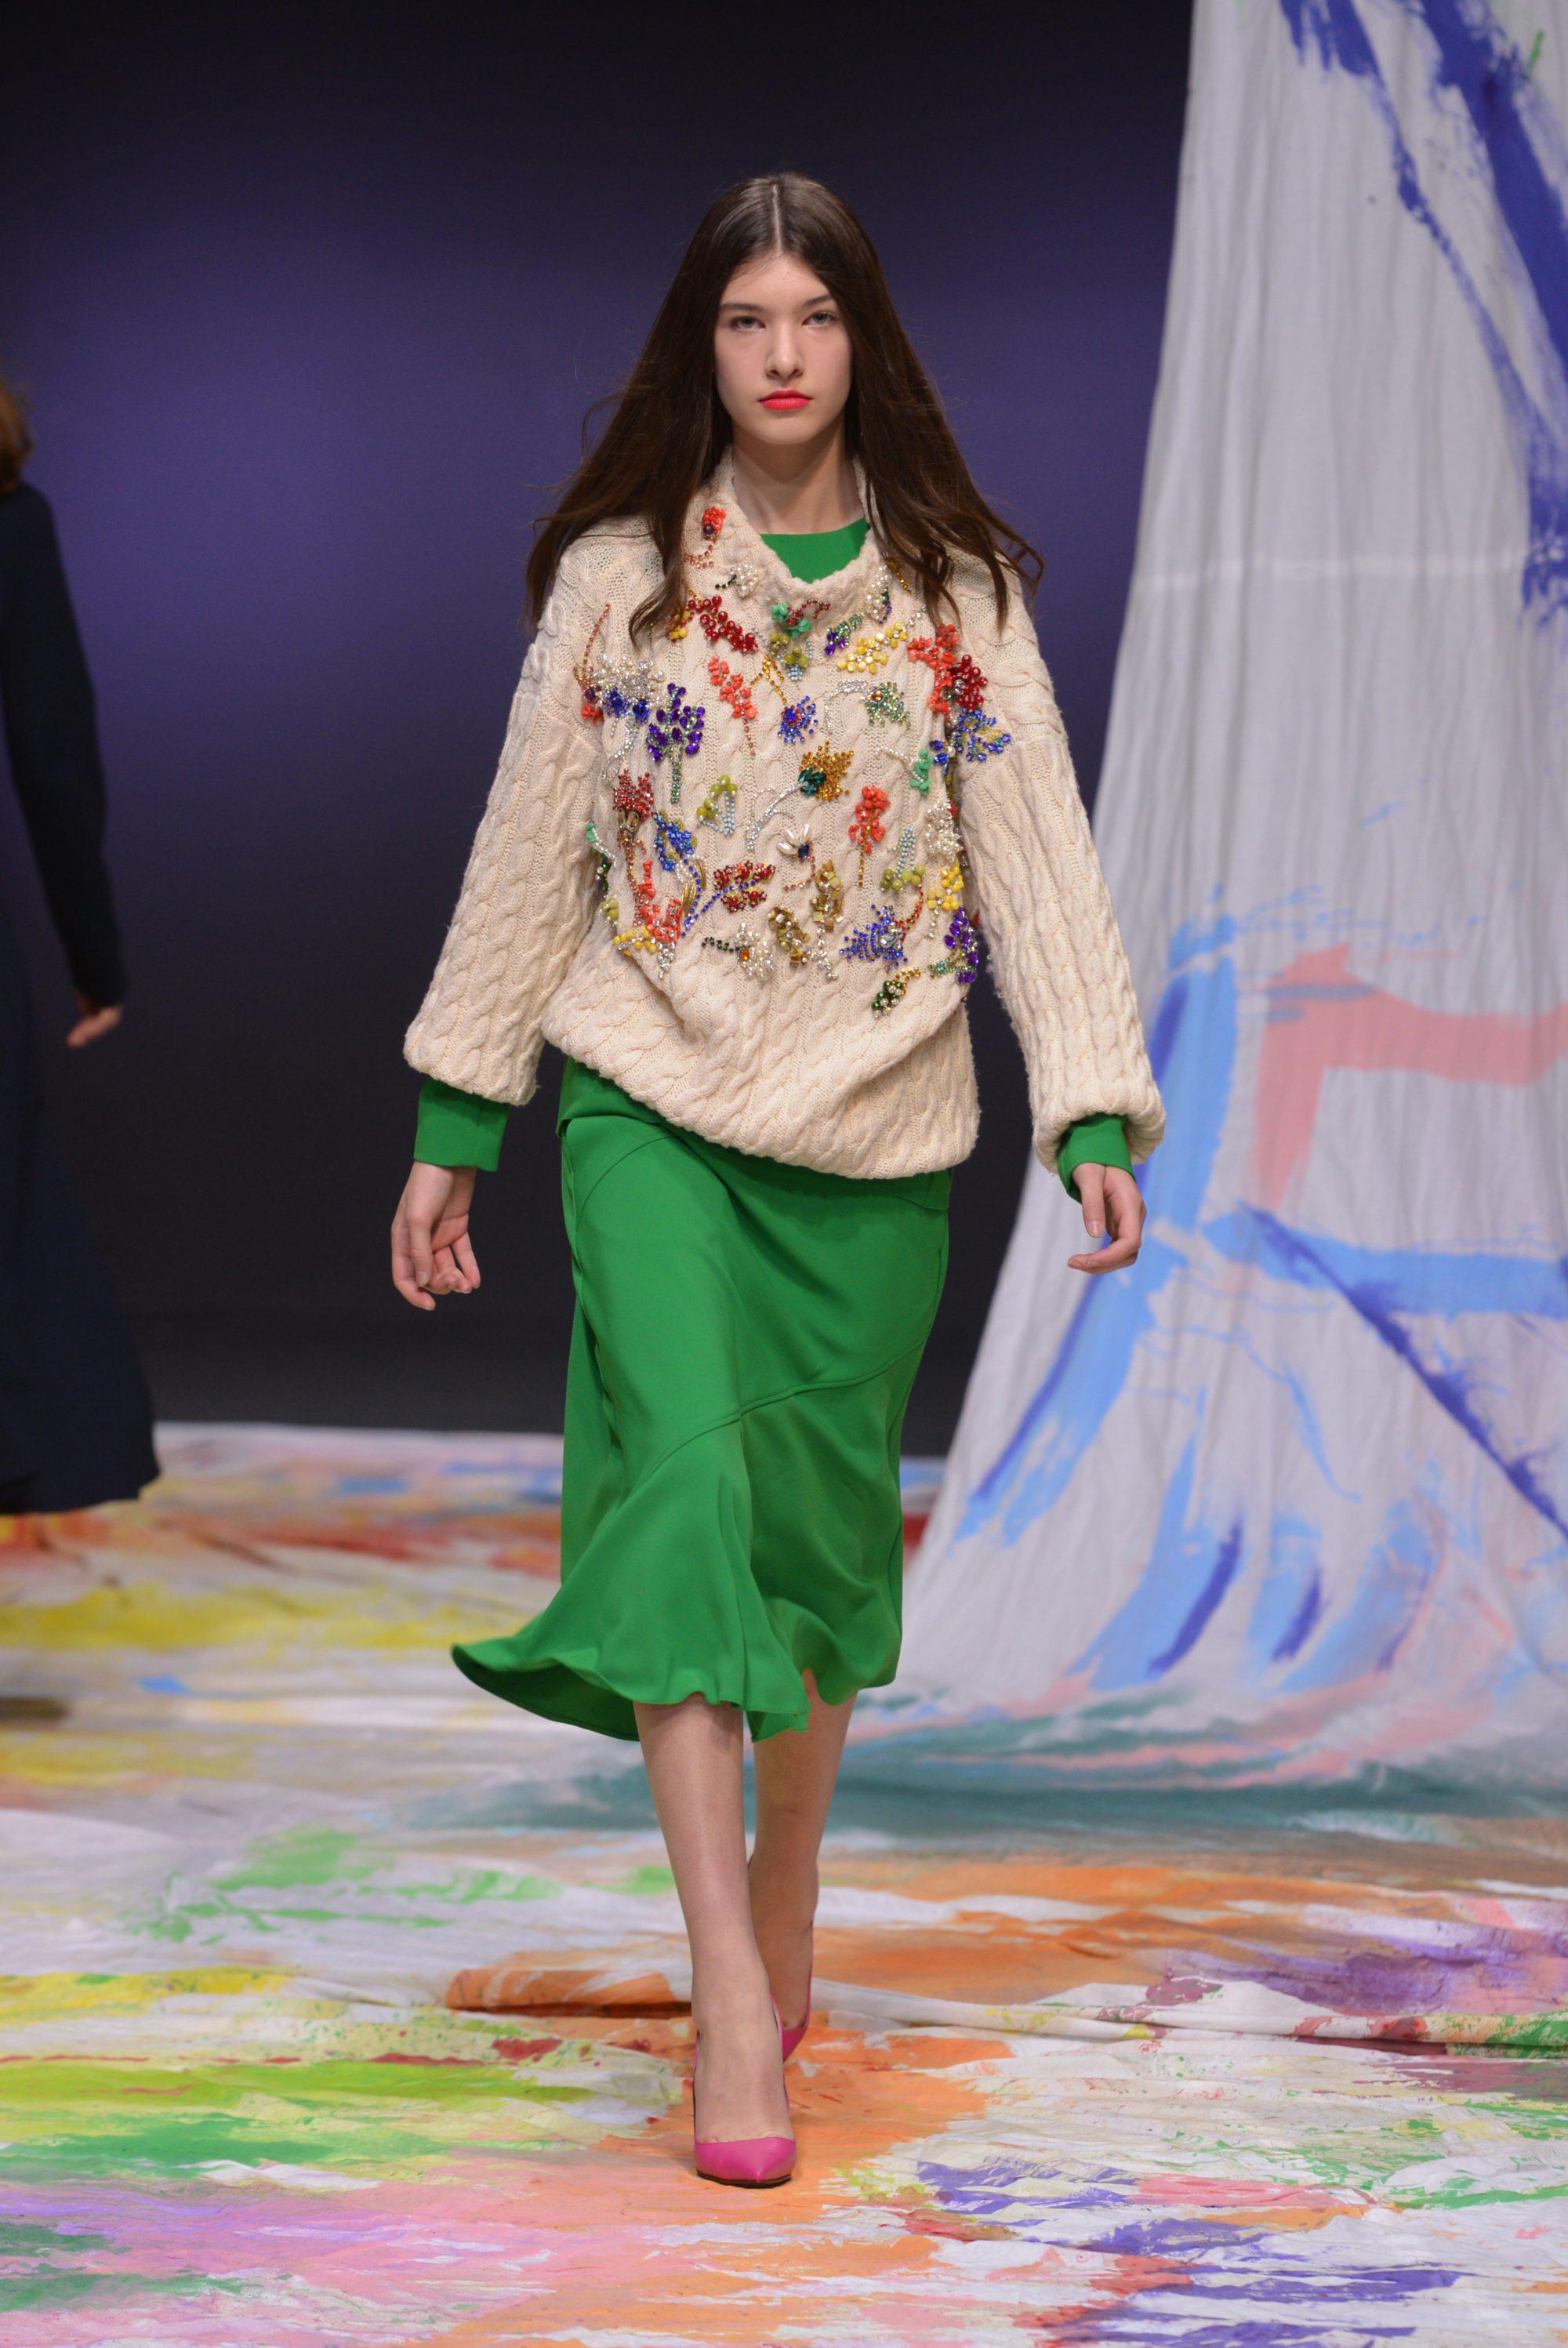 Dalood бежевая кофта крупной вязки с вышивкой в виде цветов 2019 с зеленой юбкой